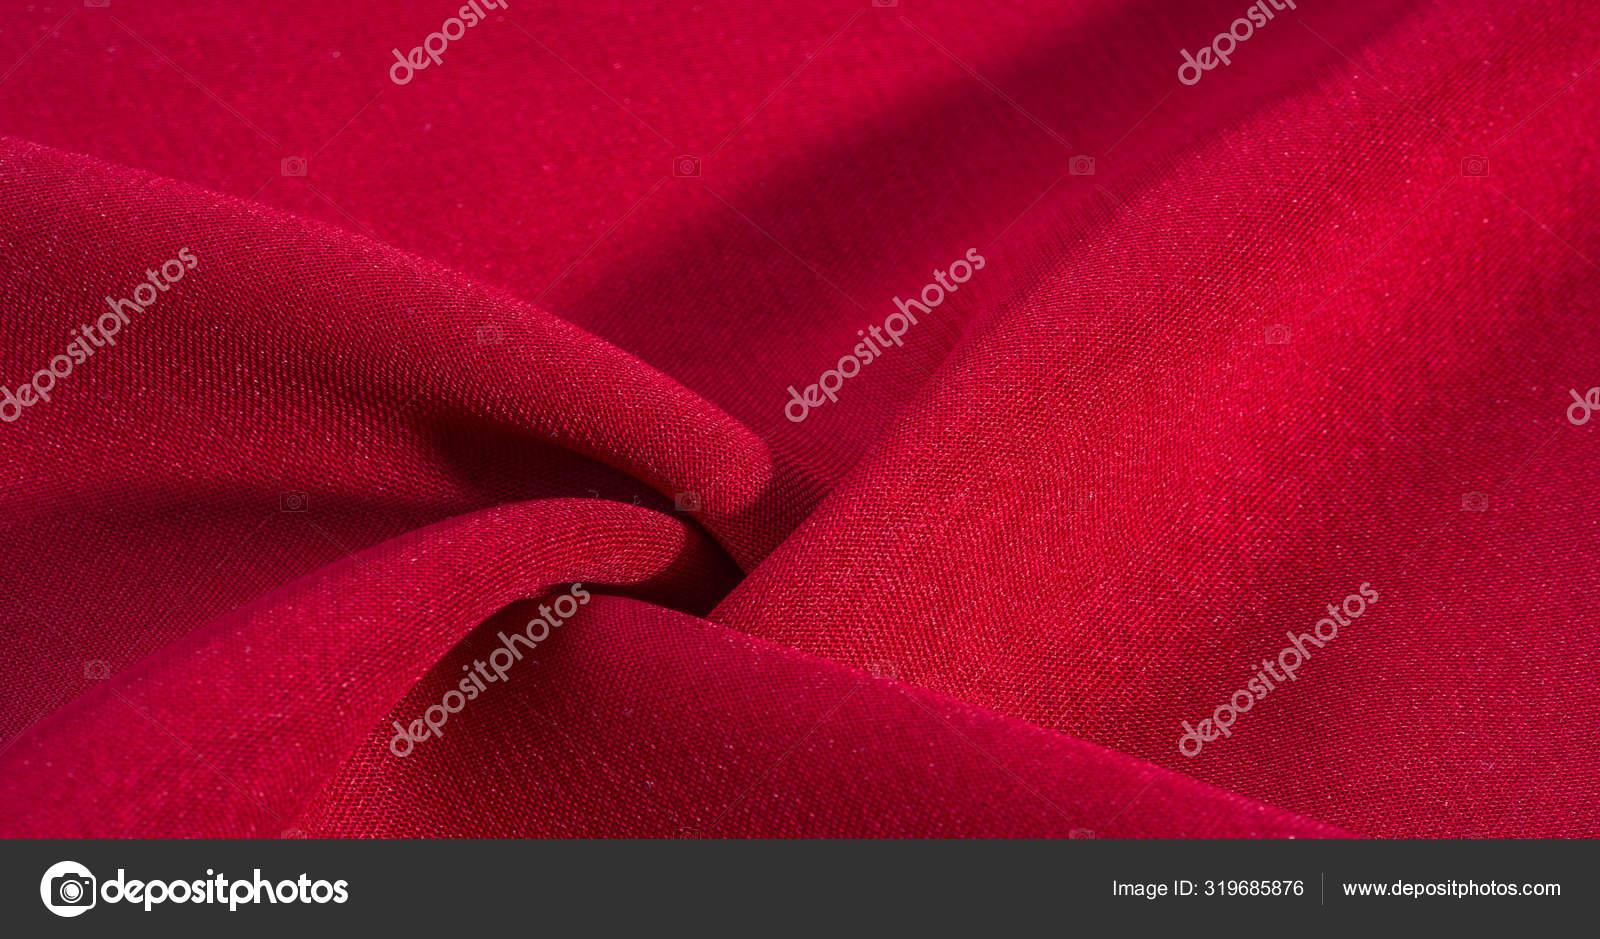 Textura Fundo Padrao Vermelho Crimson Silk Fabric Este Muito Stock Photo C Ekina1 319685876